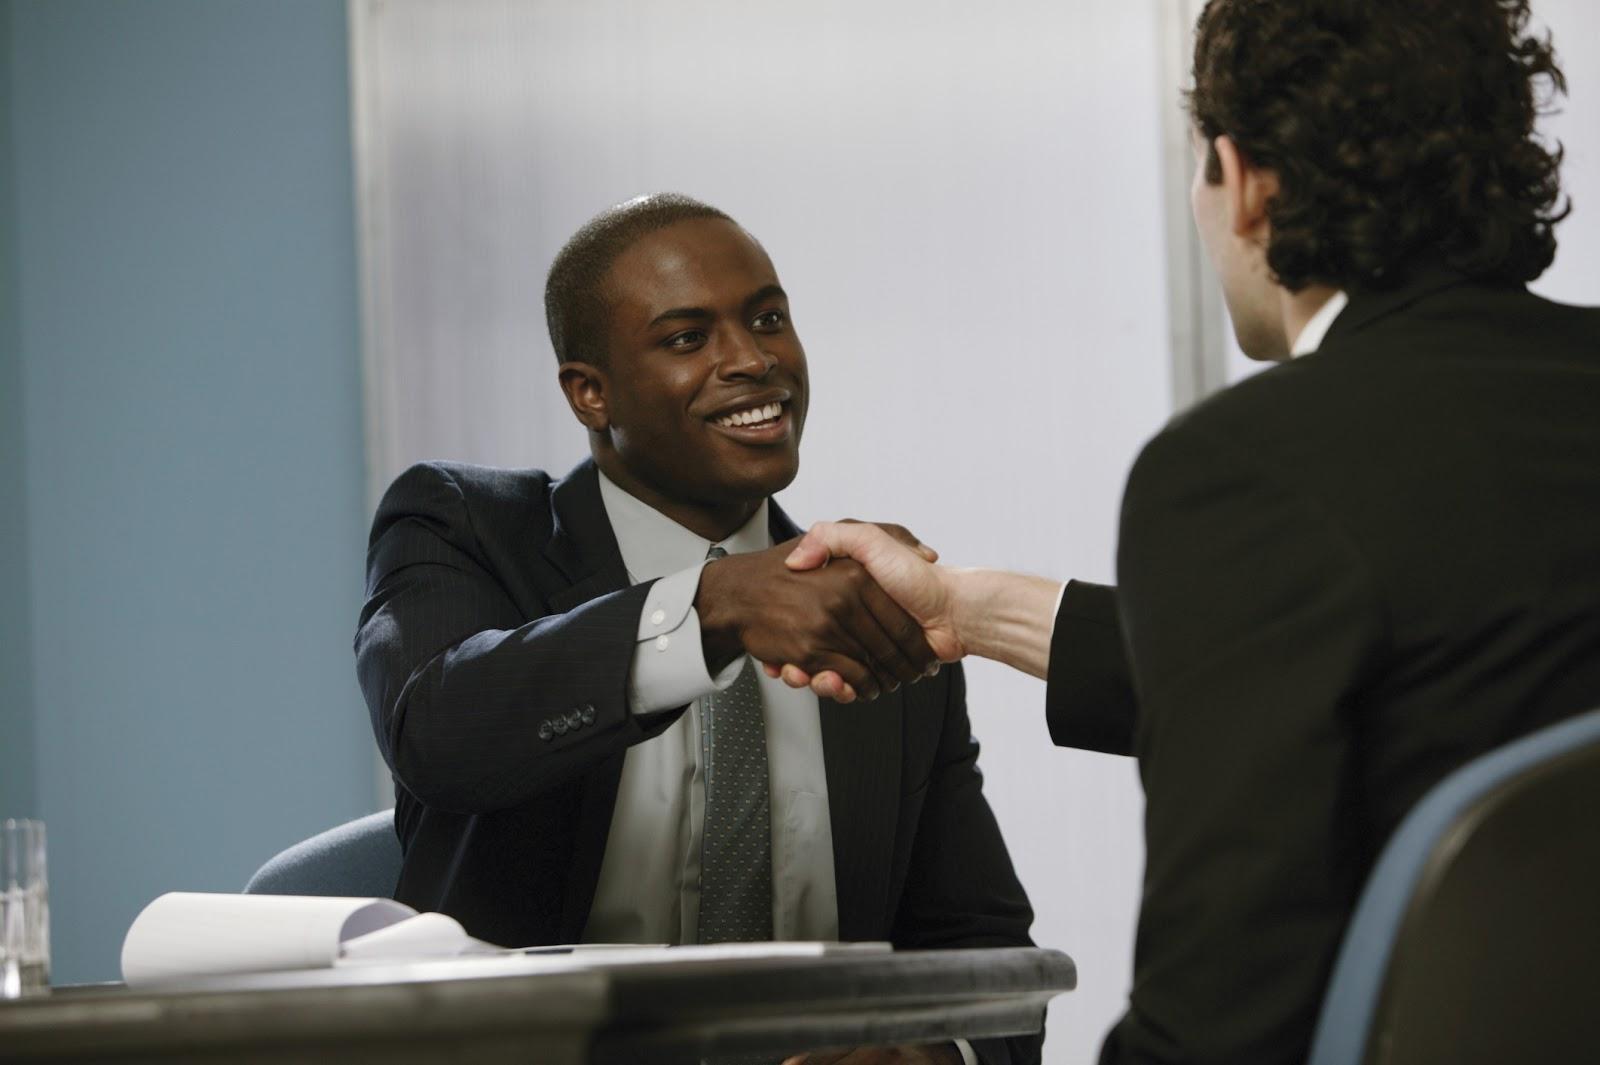 behavioral interview evaluation form cover letter templates behavioral interview evaluation form interview evaluation form talentron job interview practice test 1 question 1 00